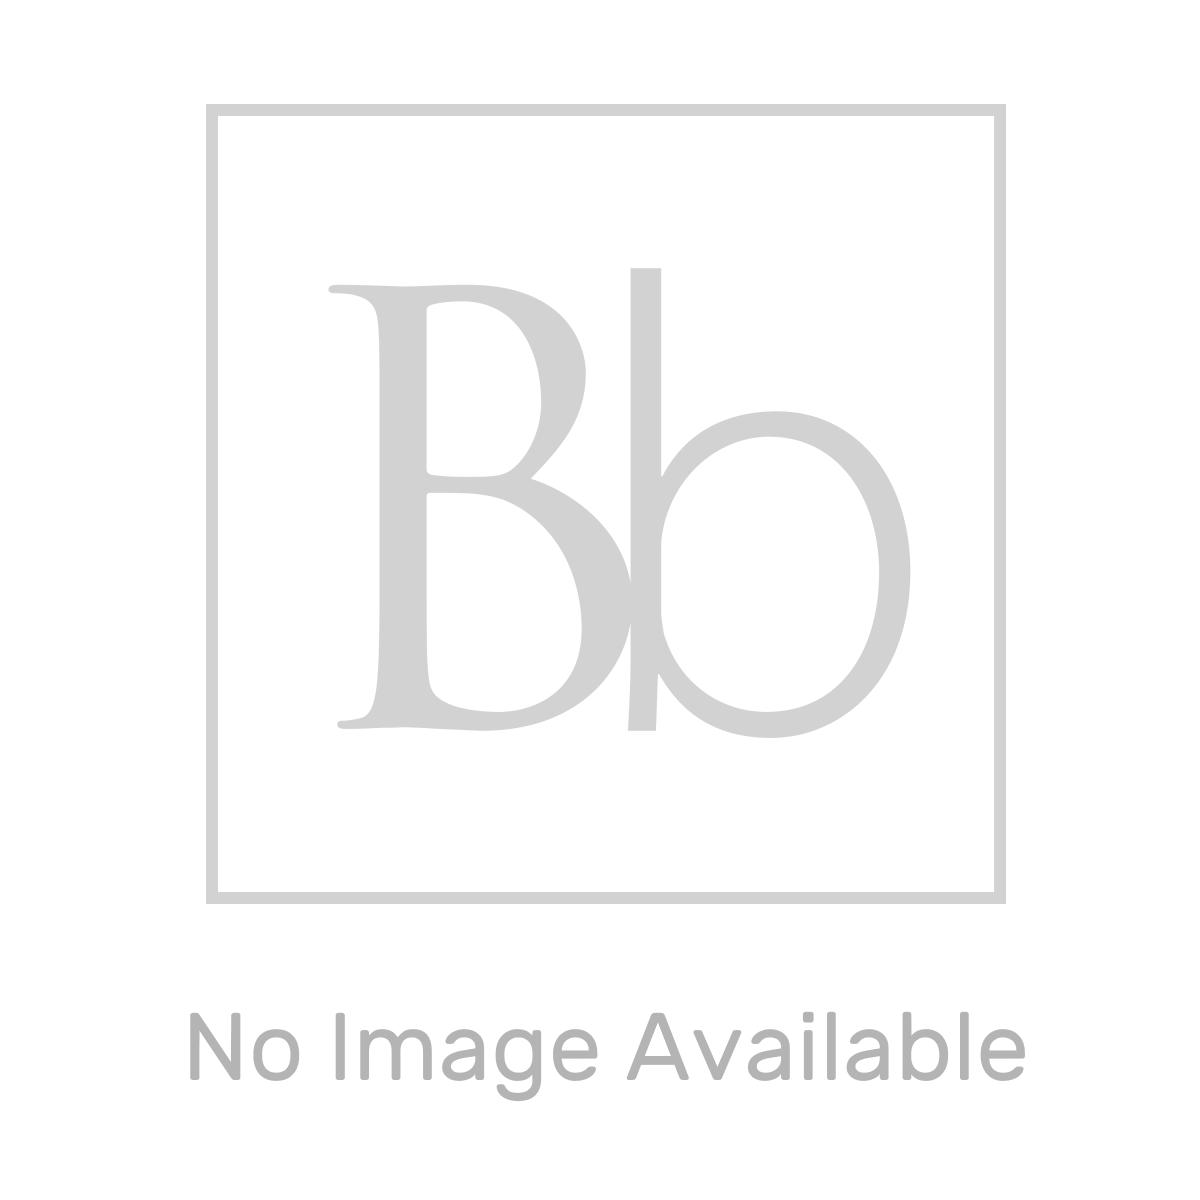 Aquadart White Slate Shower Tray 1600 x 900 Dimension